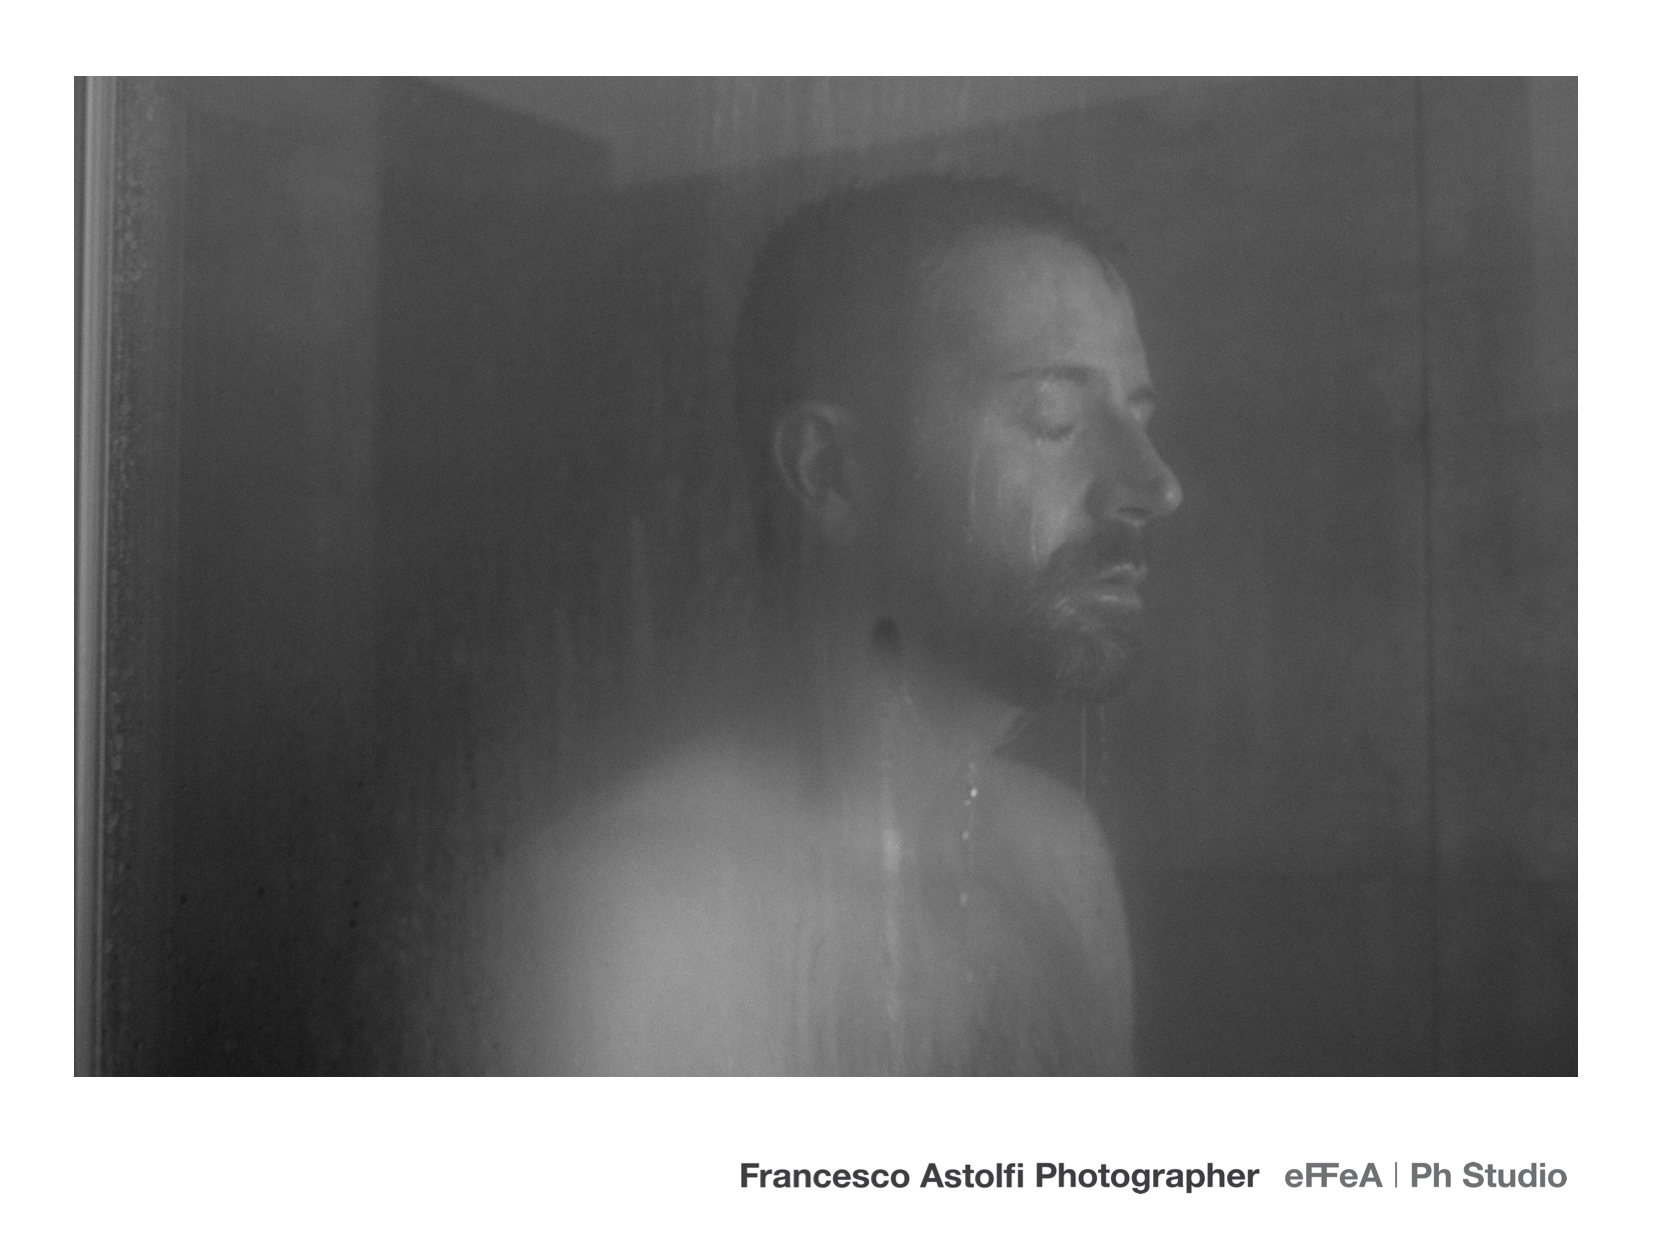 005 - ANDREA S. - Photo by Francesco Astolfi